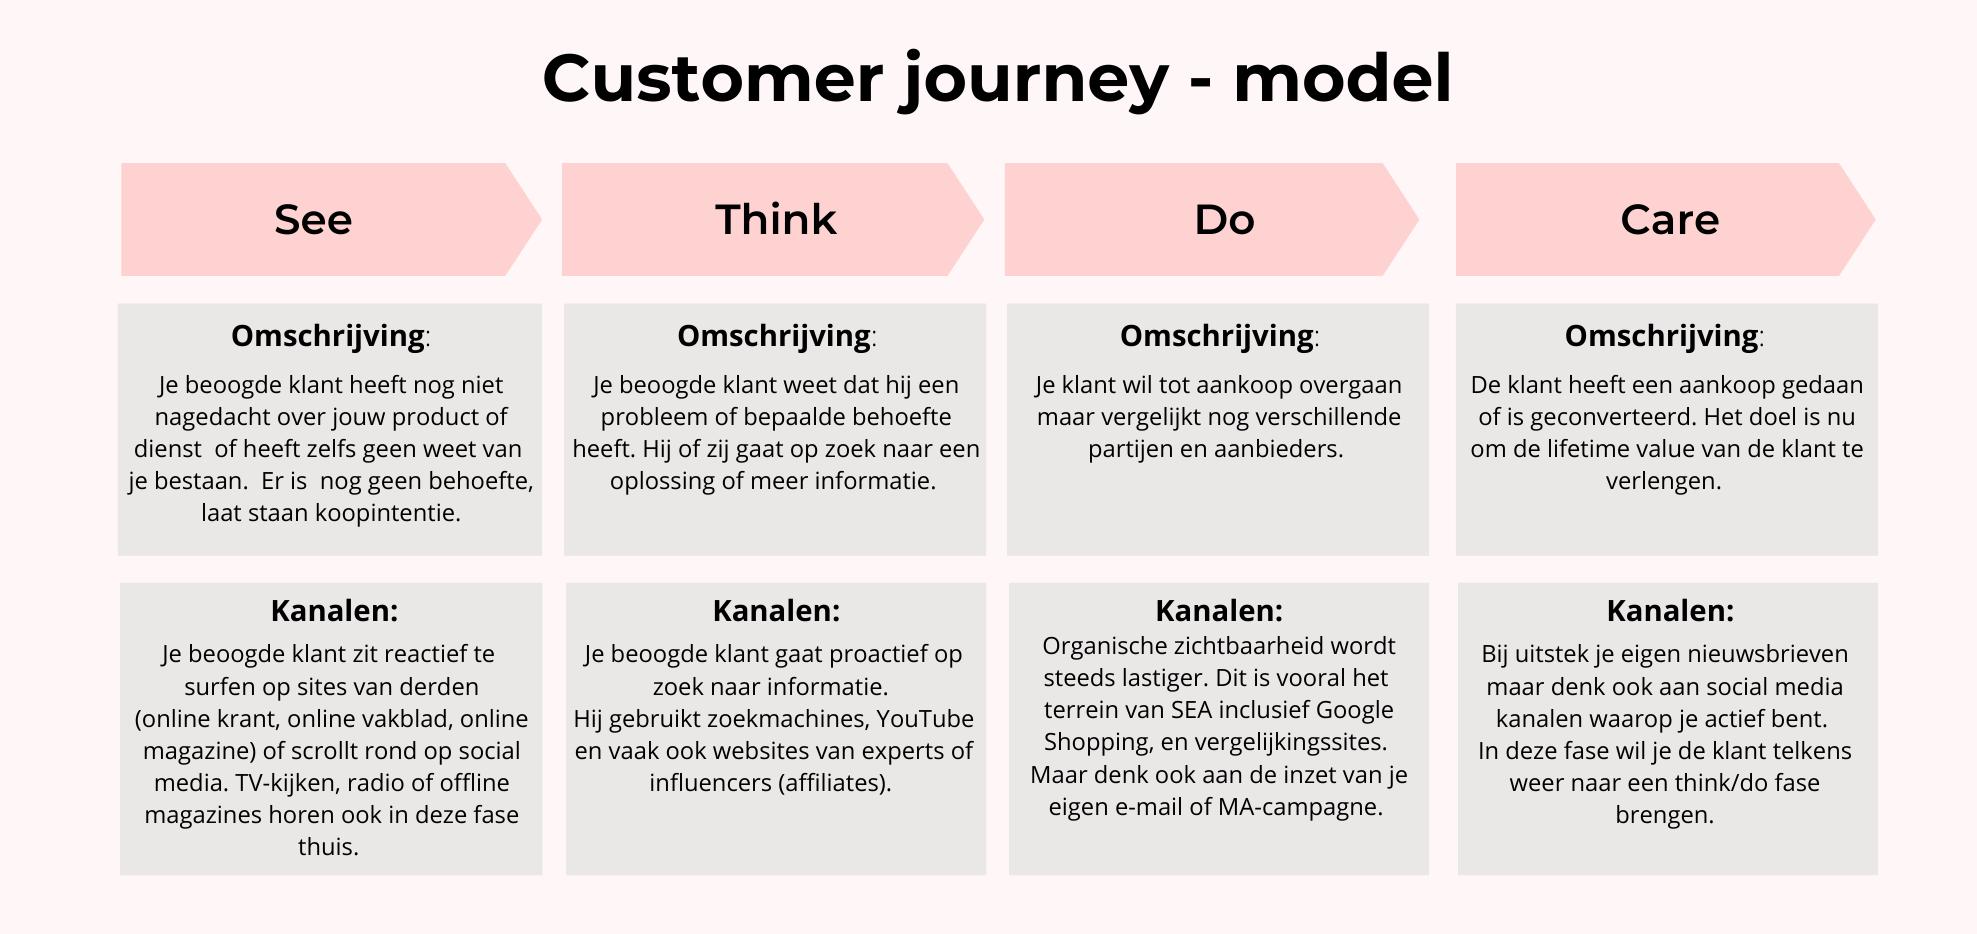 customer journey model en kanalen uitgelegd